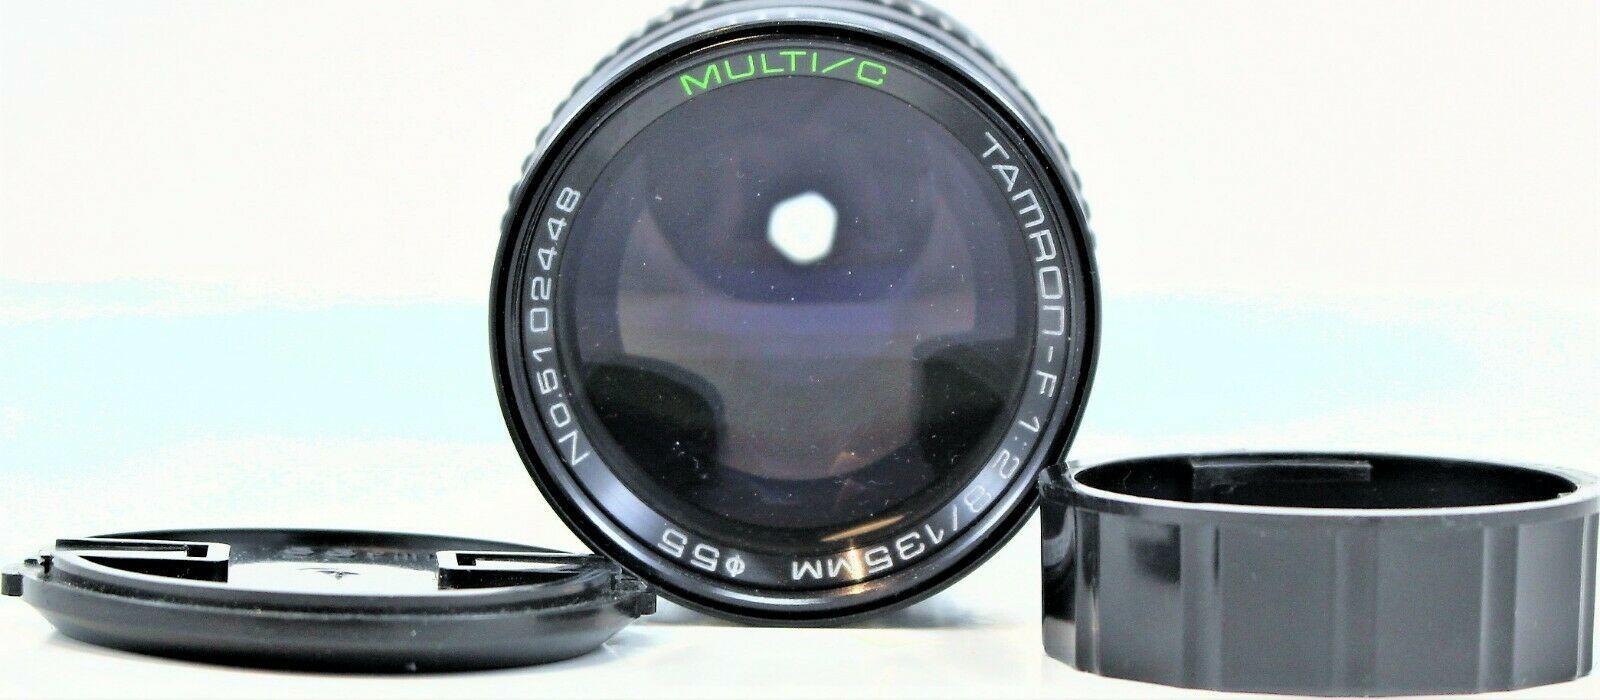 Tamron Multi C F 1:2.8 135mm Camera Lens for Nikon AI With Soft Case image 2